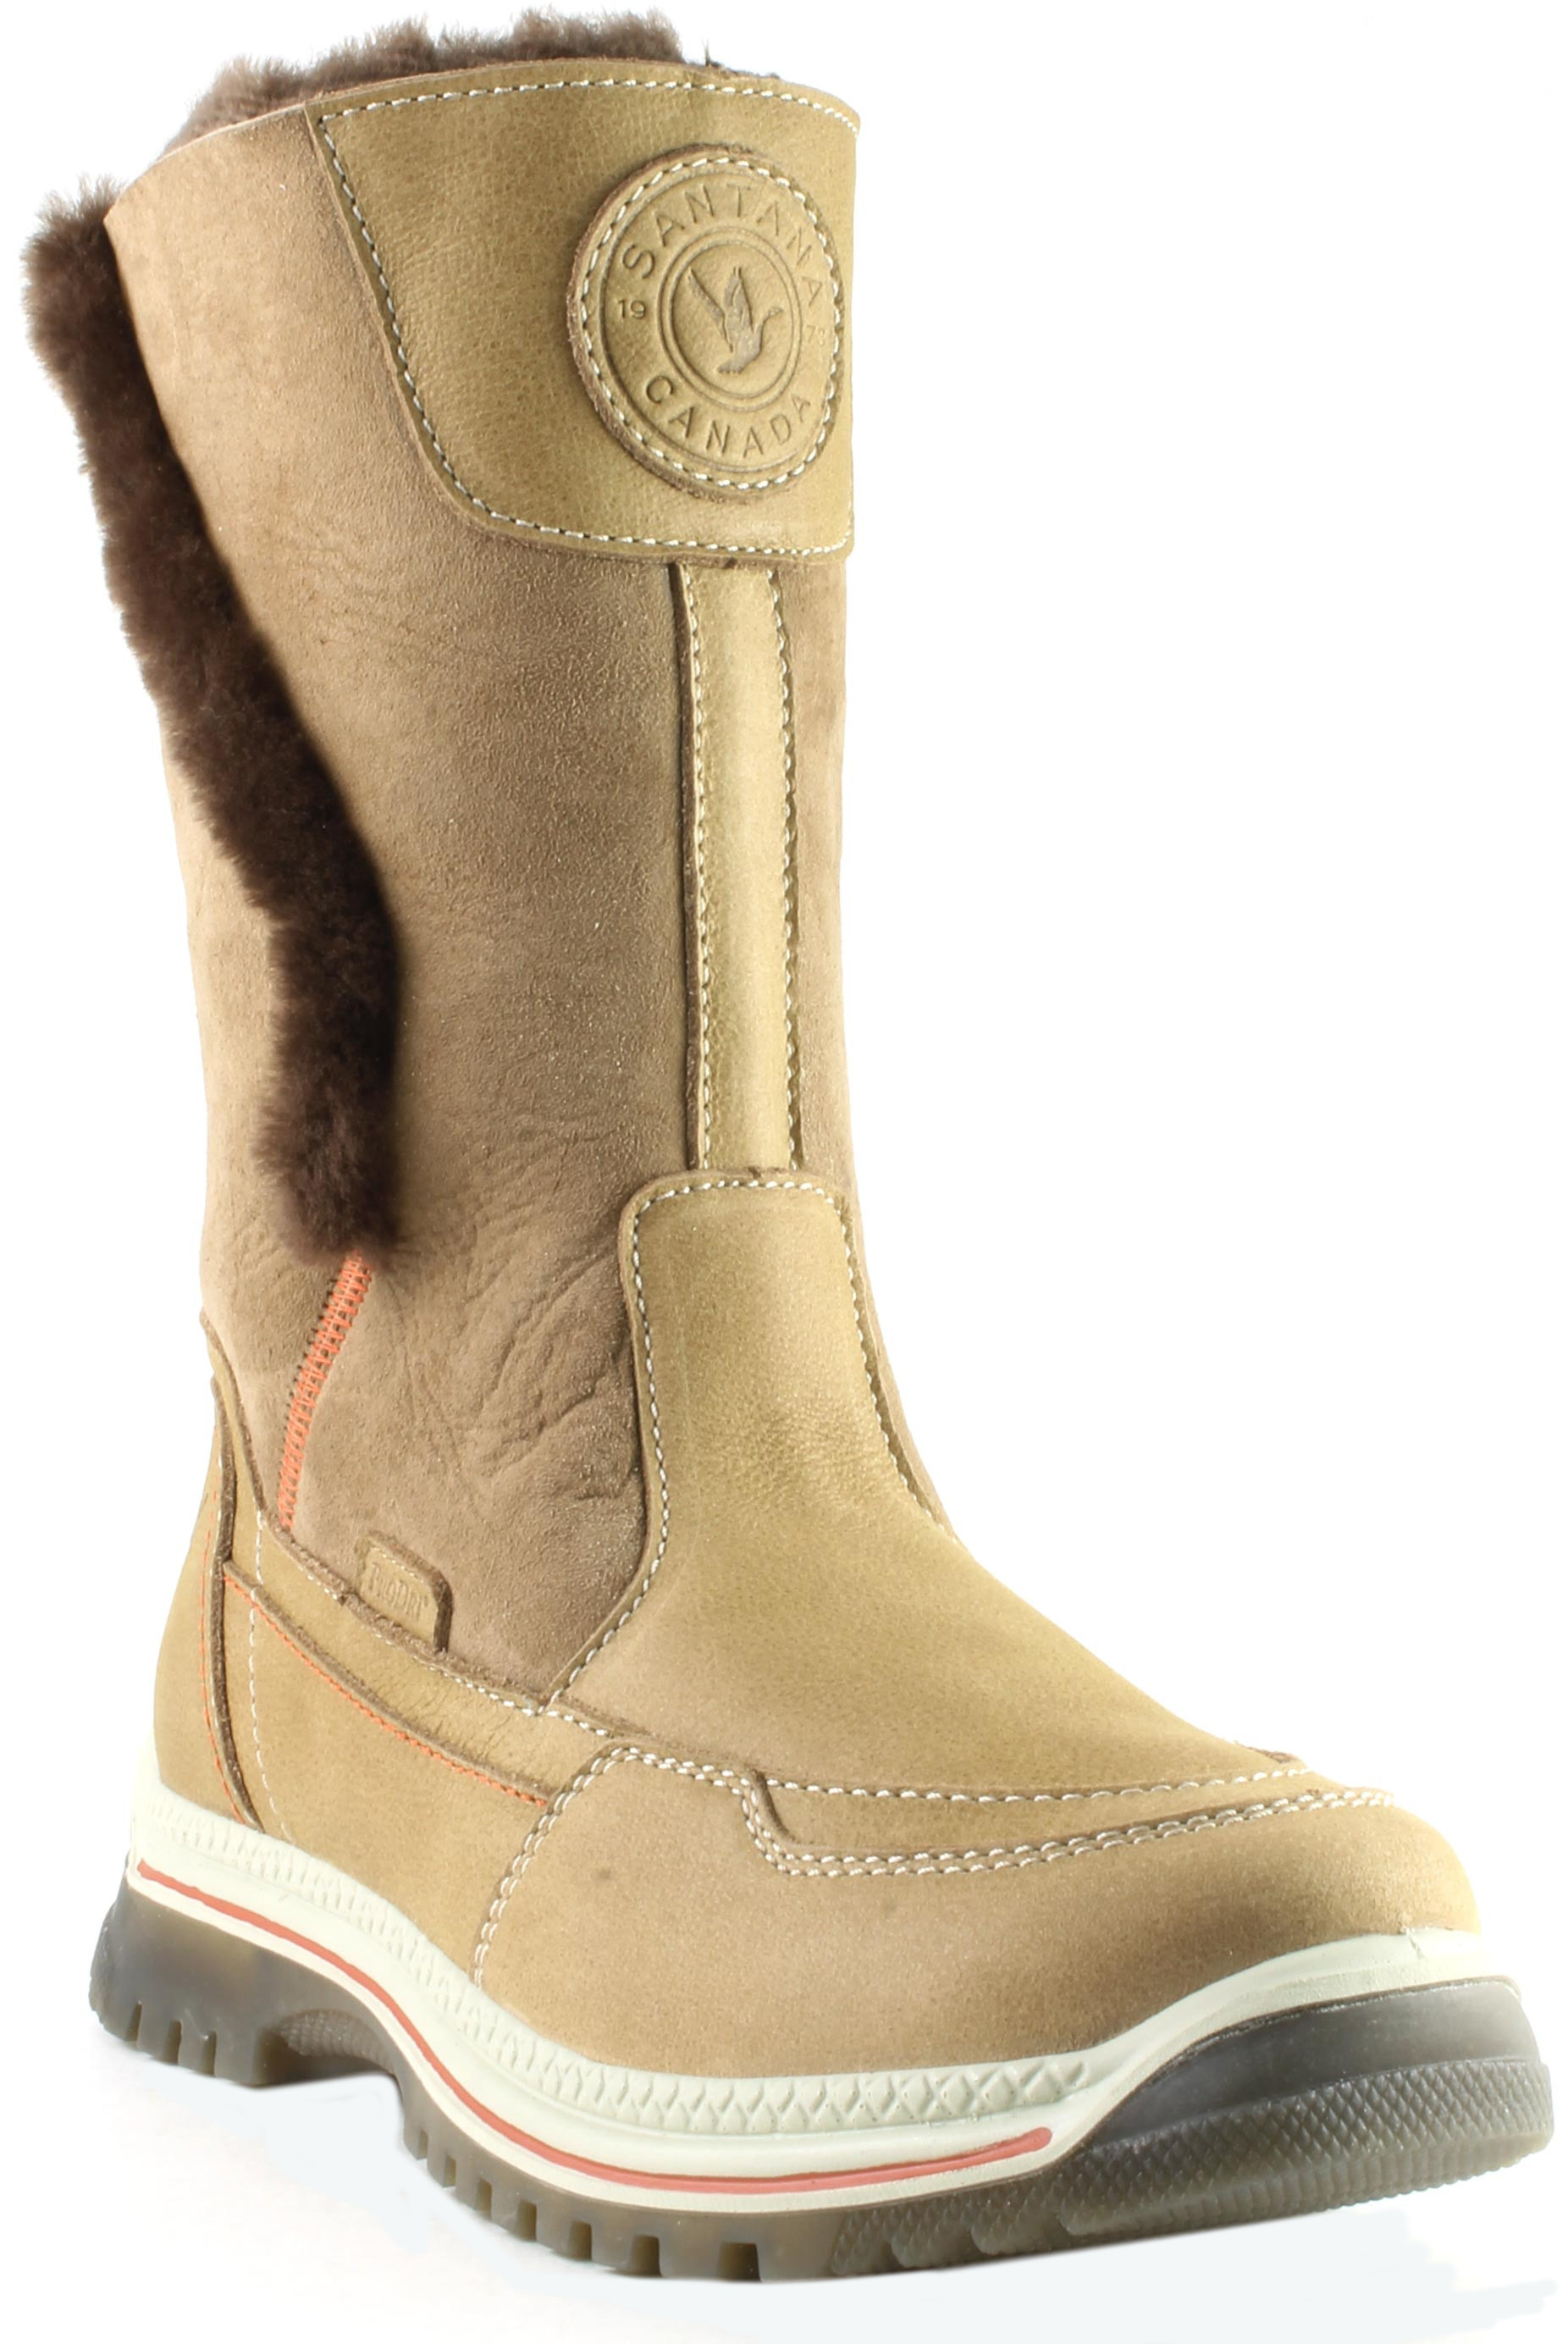 e4adfeac41eb3 Santana Canada Seraphine Winter Boot - Women's 185-0000179-6, 47% Off with  Free S&H — CampSaver